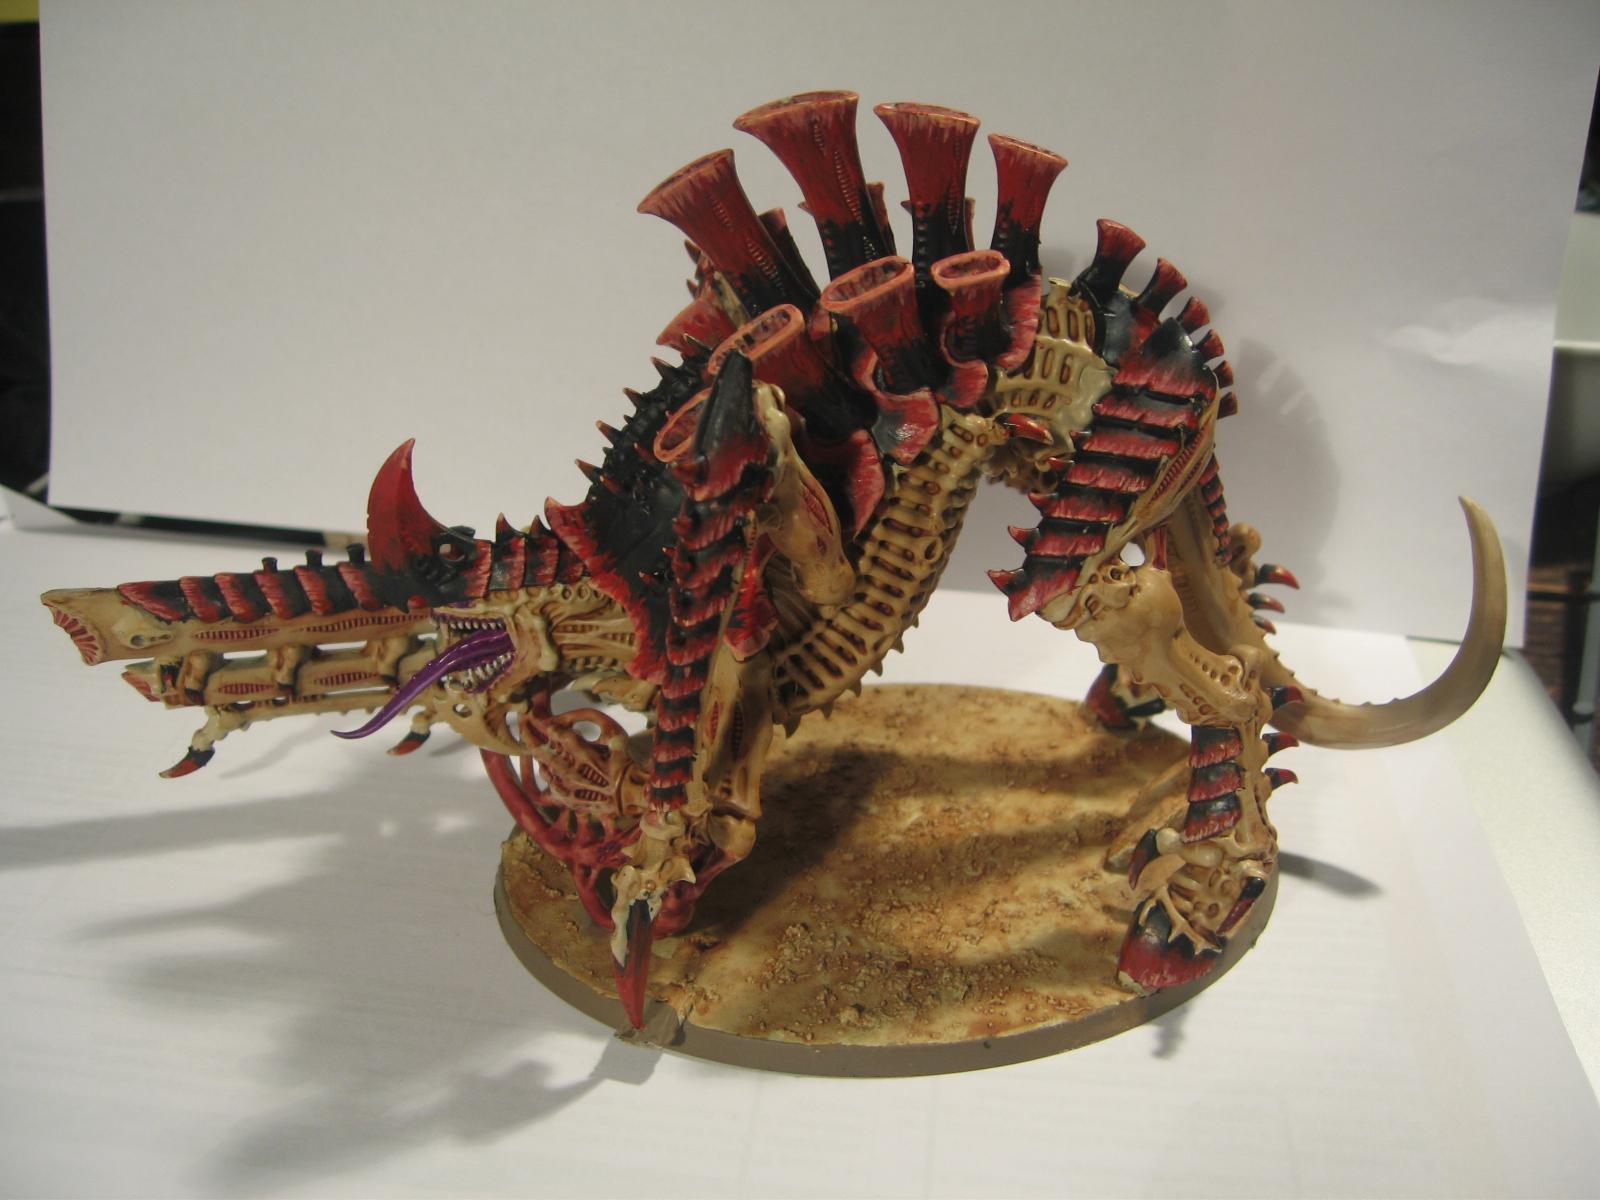 Feathering, Hivefleet Kraken, Ink, Red, Spray, The Army Painter, Tyranids, Tyrannofex, Yellow